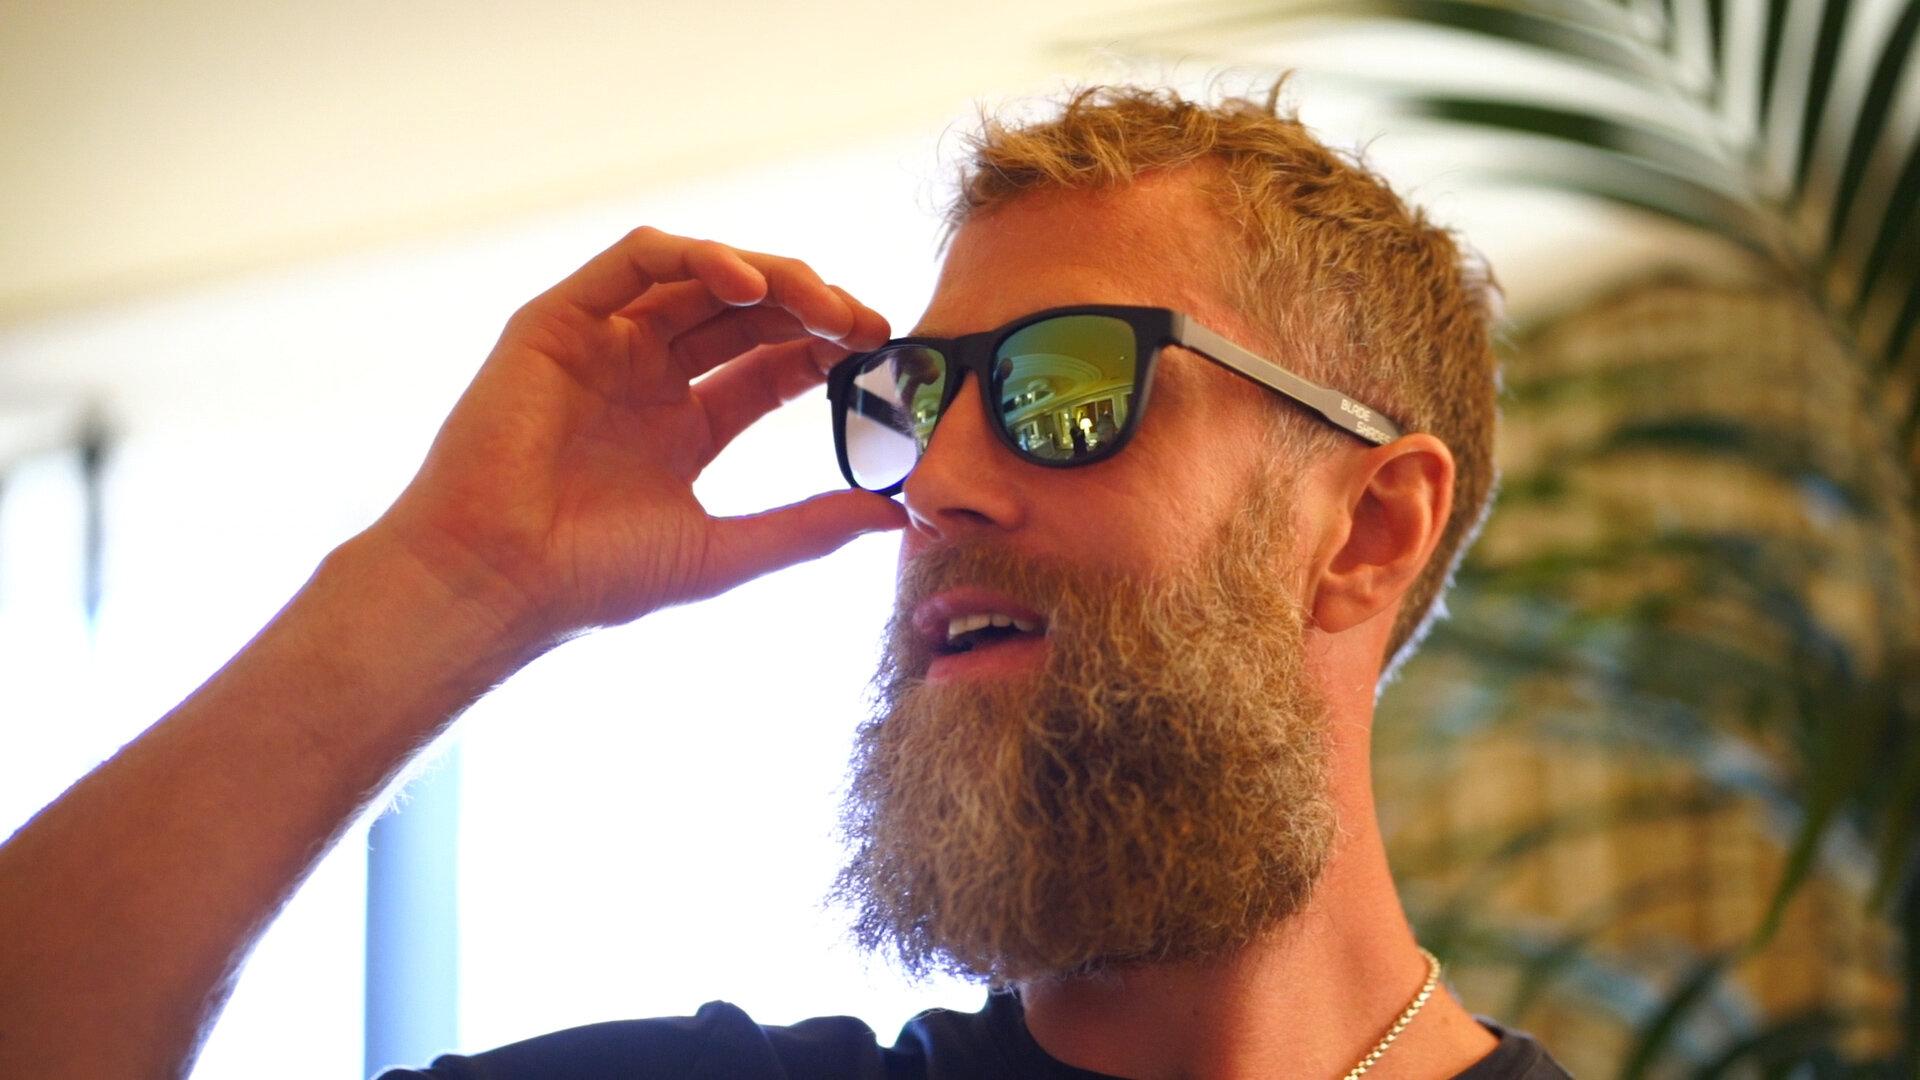 Blade Shades - Hockey stick sunglasses for the hockey world.